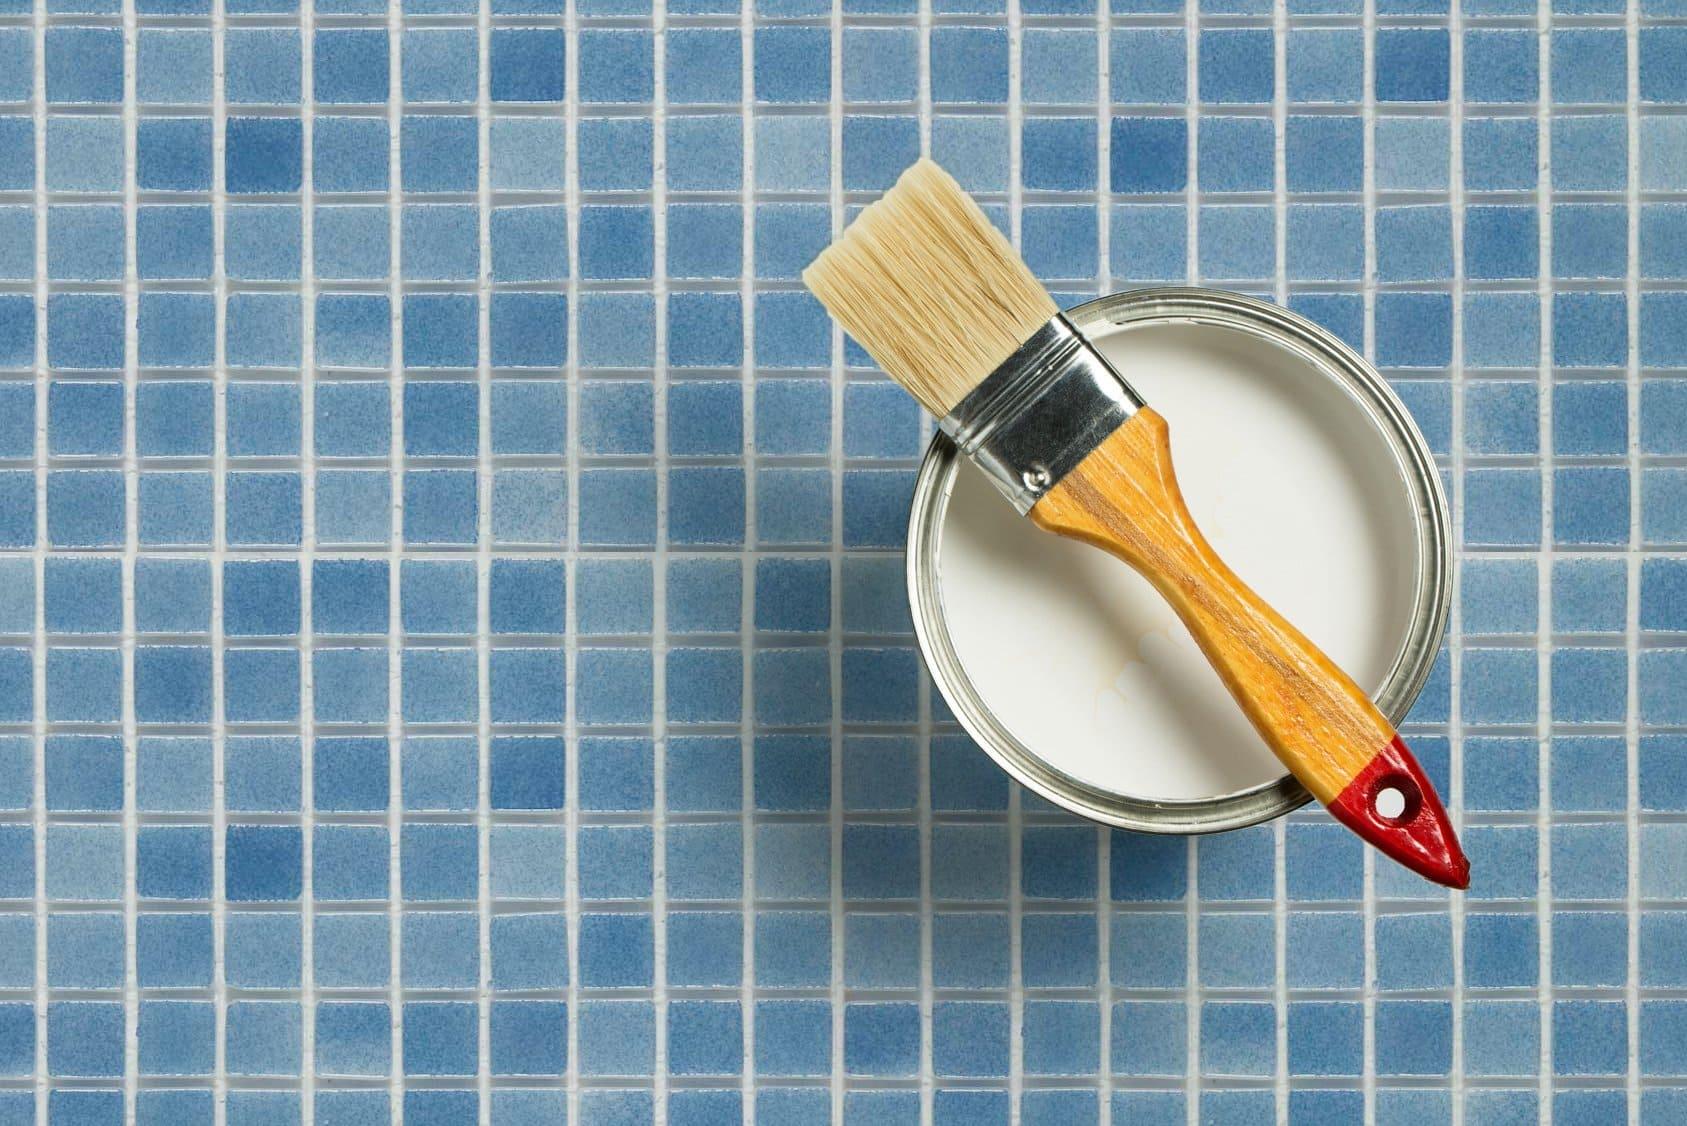 Pintar azulejos de exterior